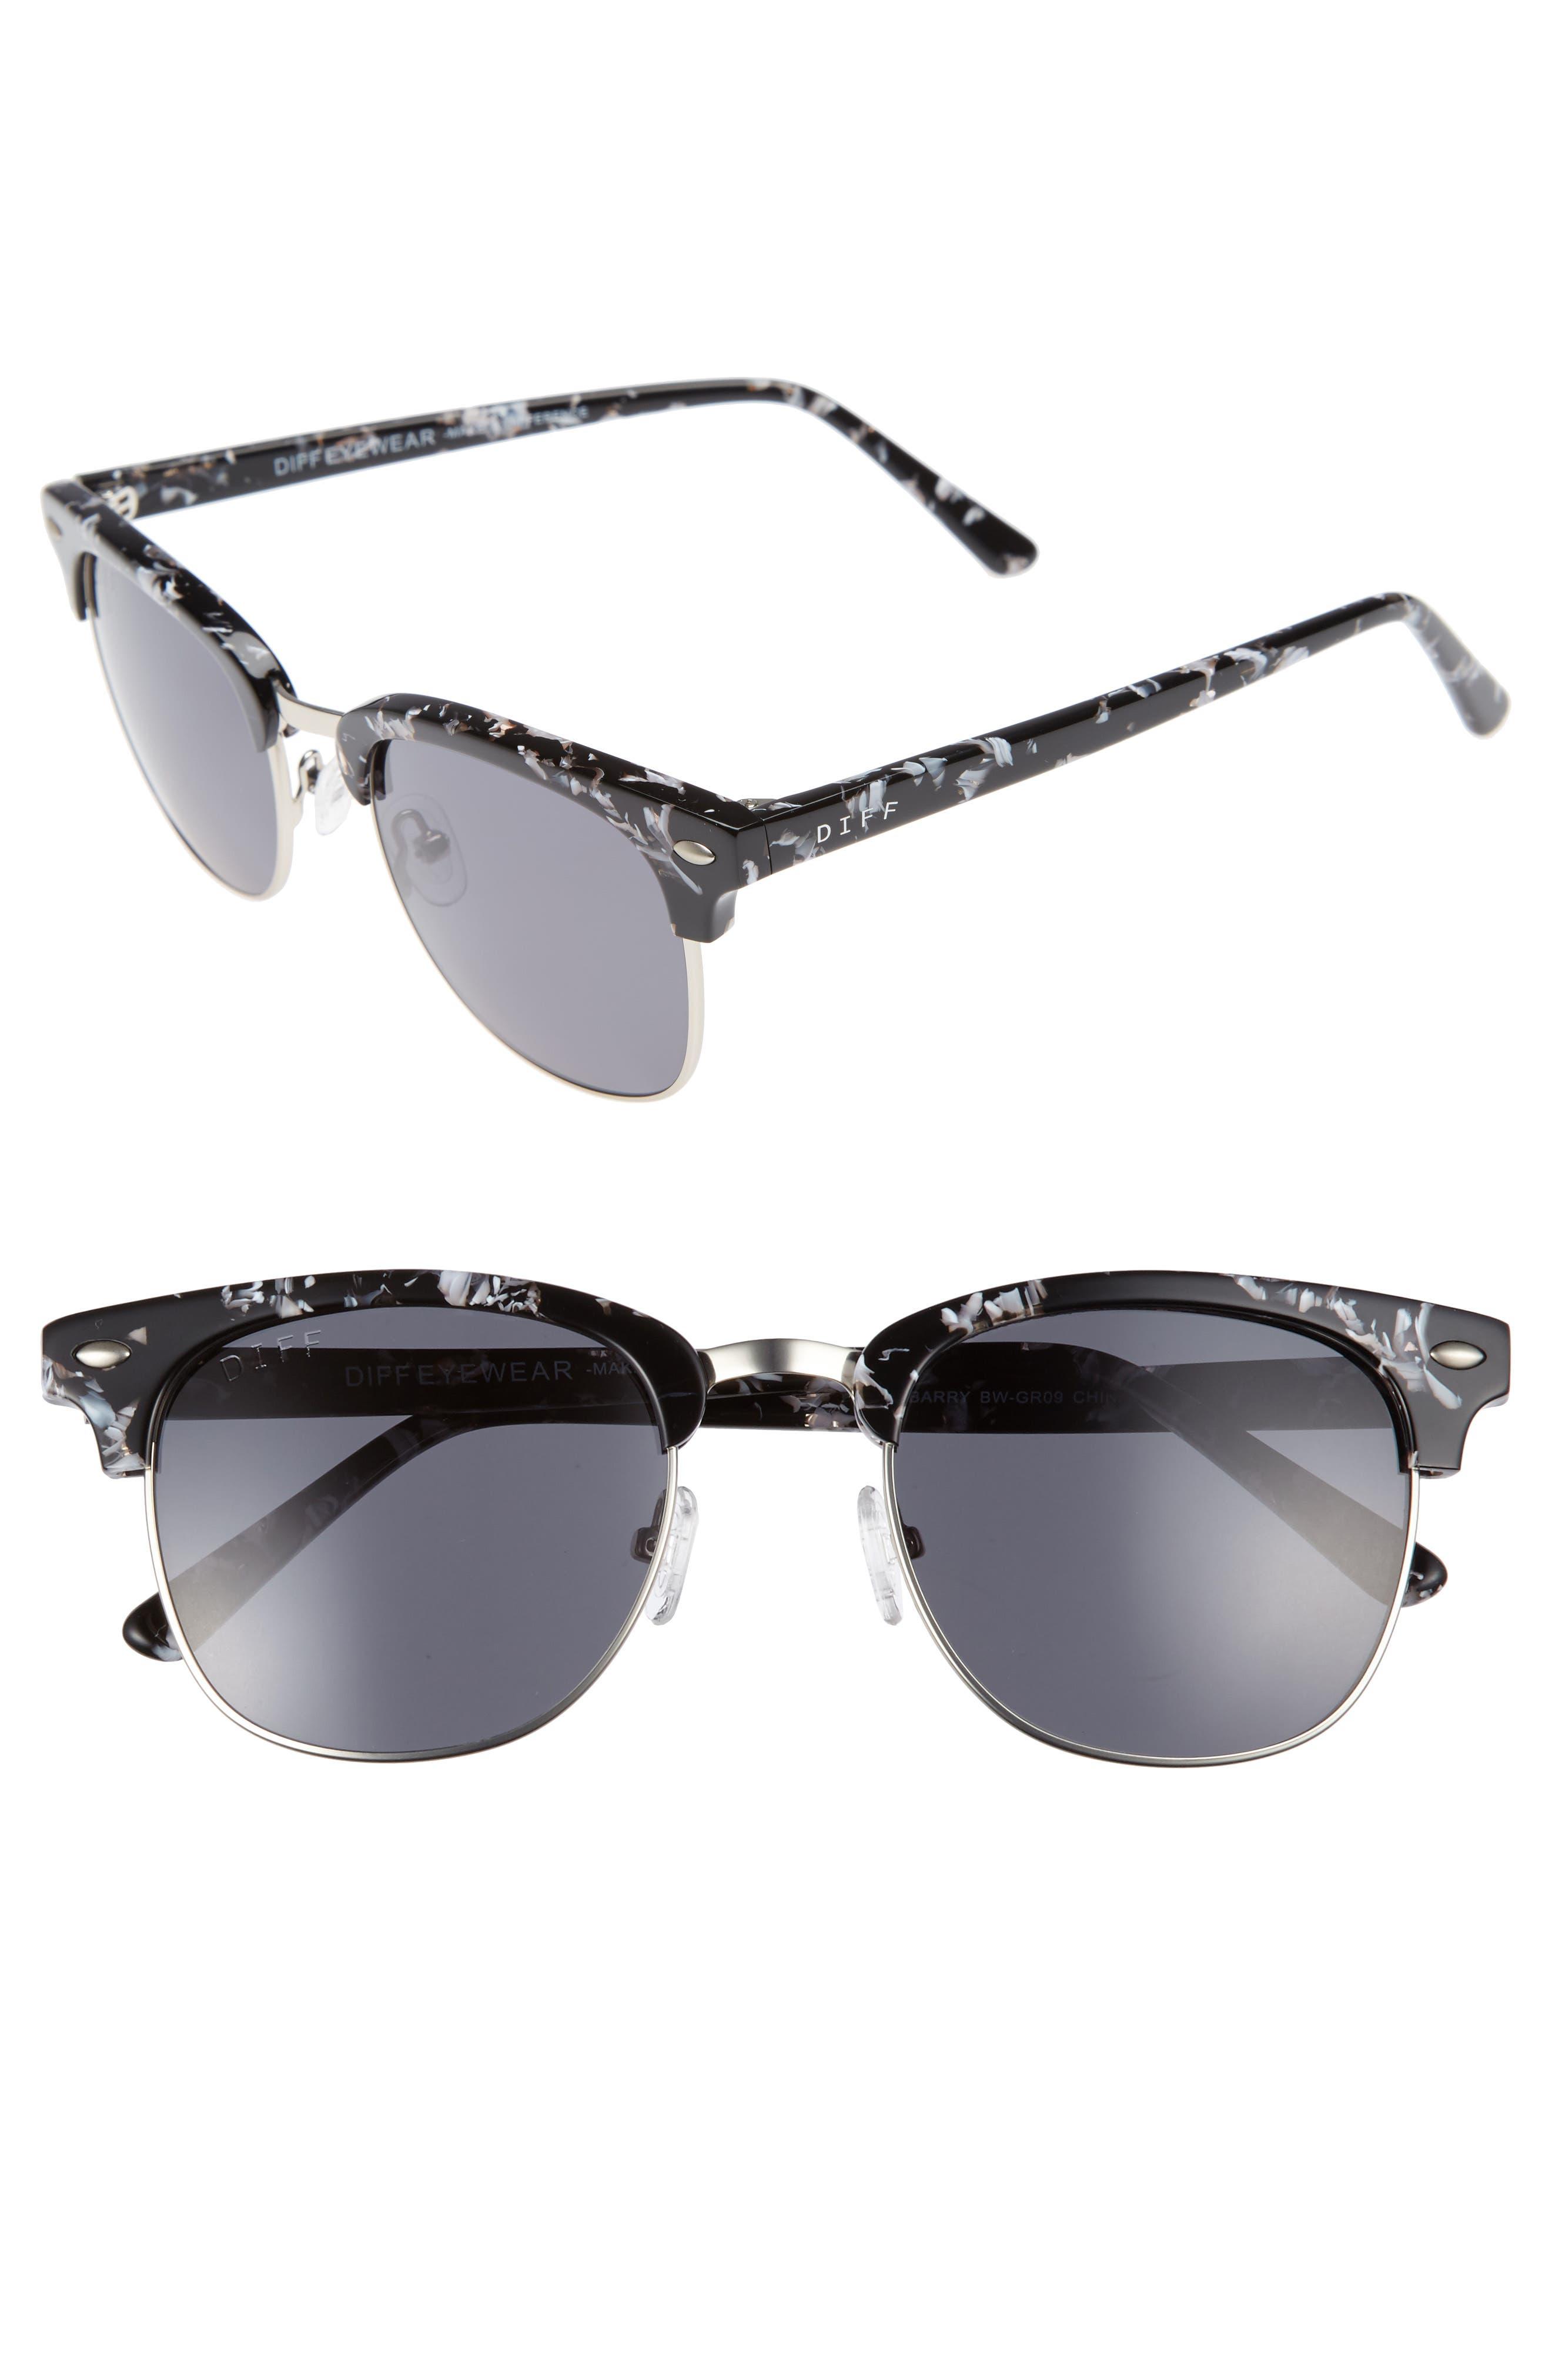 Barry 51mm Polarized Retro Sunglasses,                             Main thumbnail 3, color,